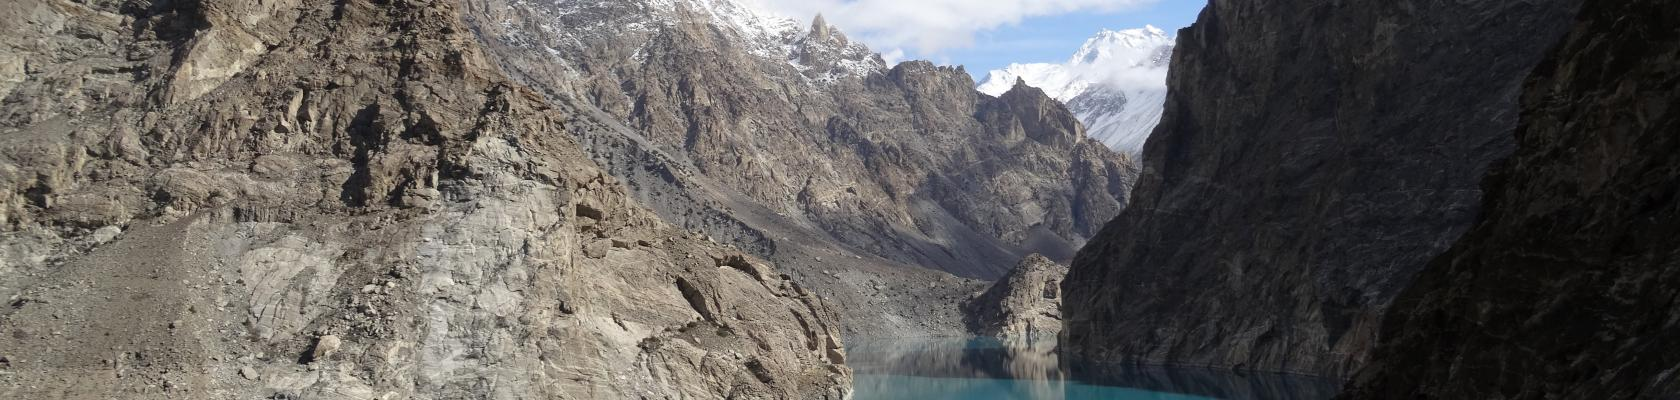 lake, Pakistan, wilderness